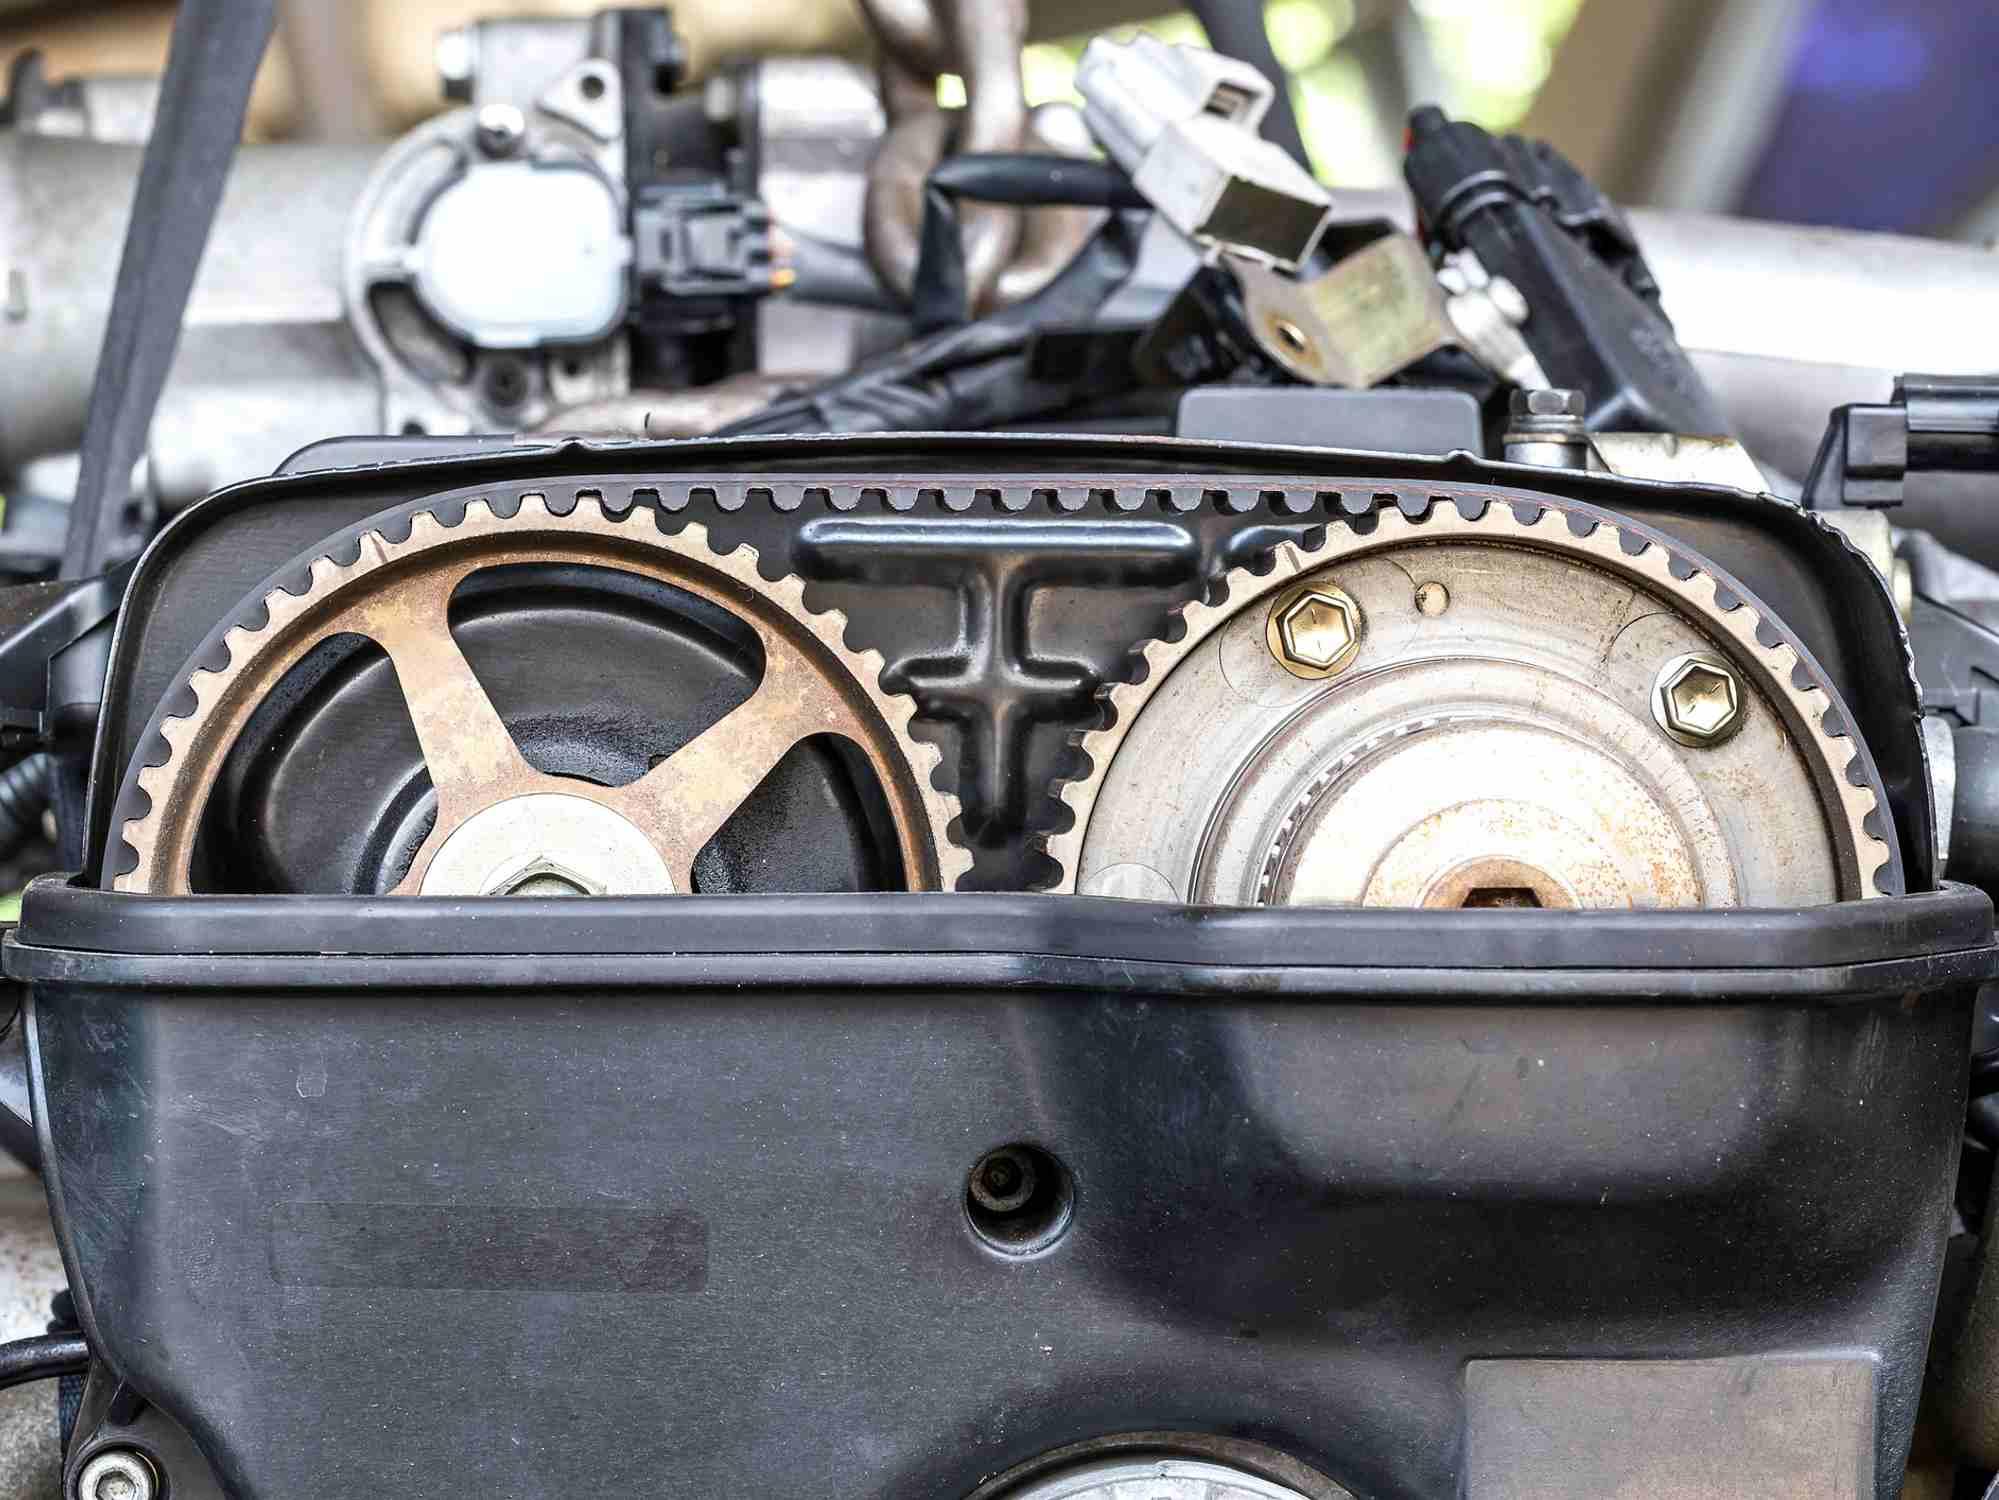 timing belt and camshaft pulleys